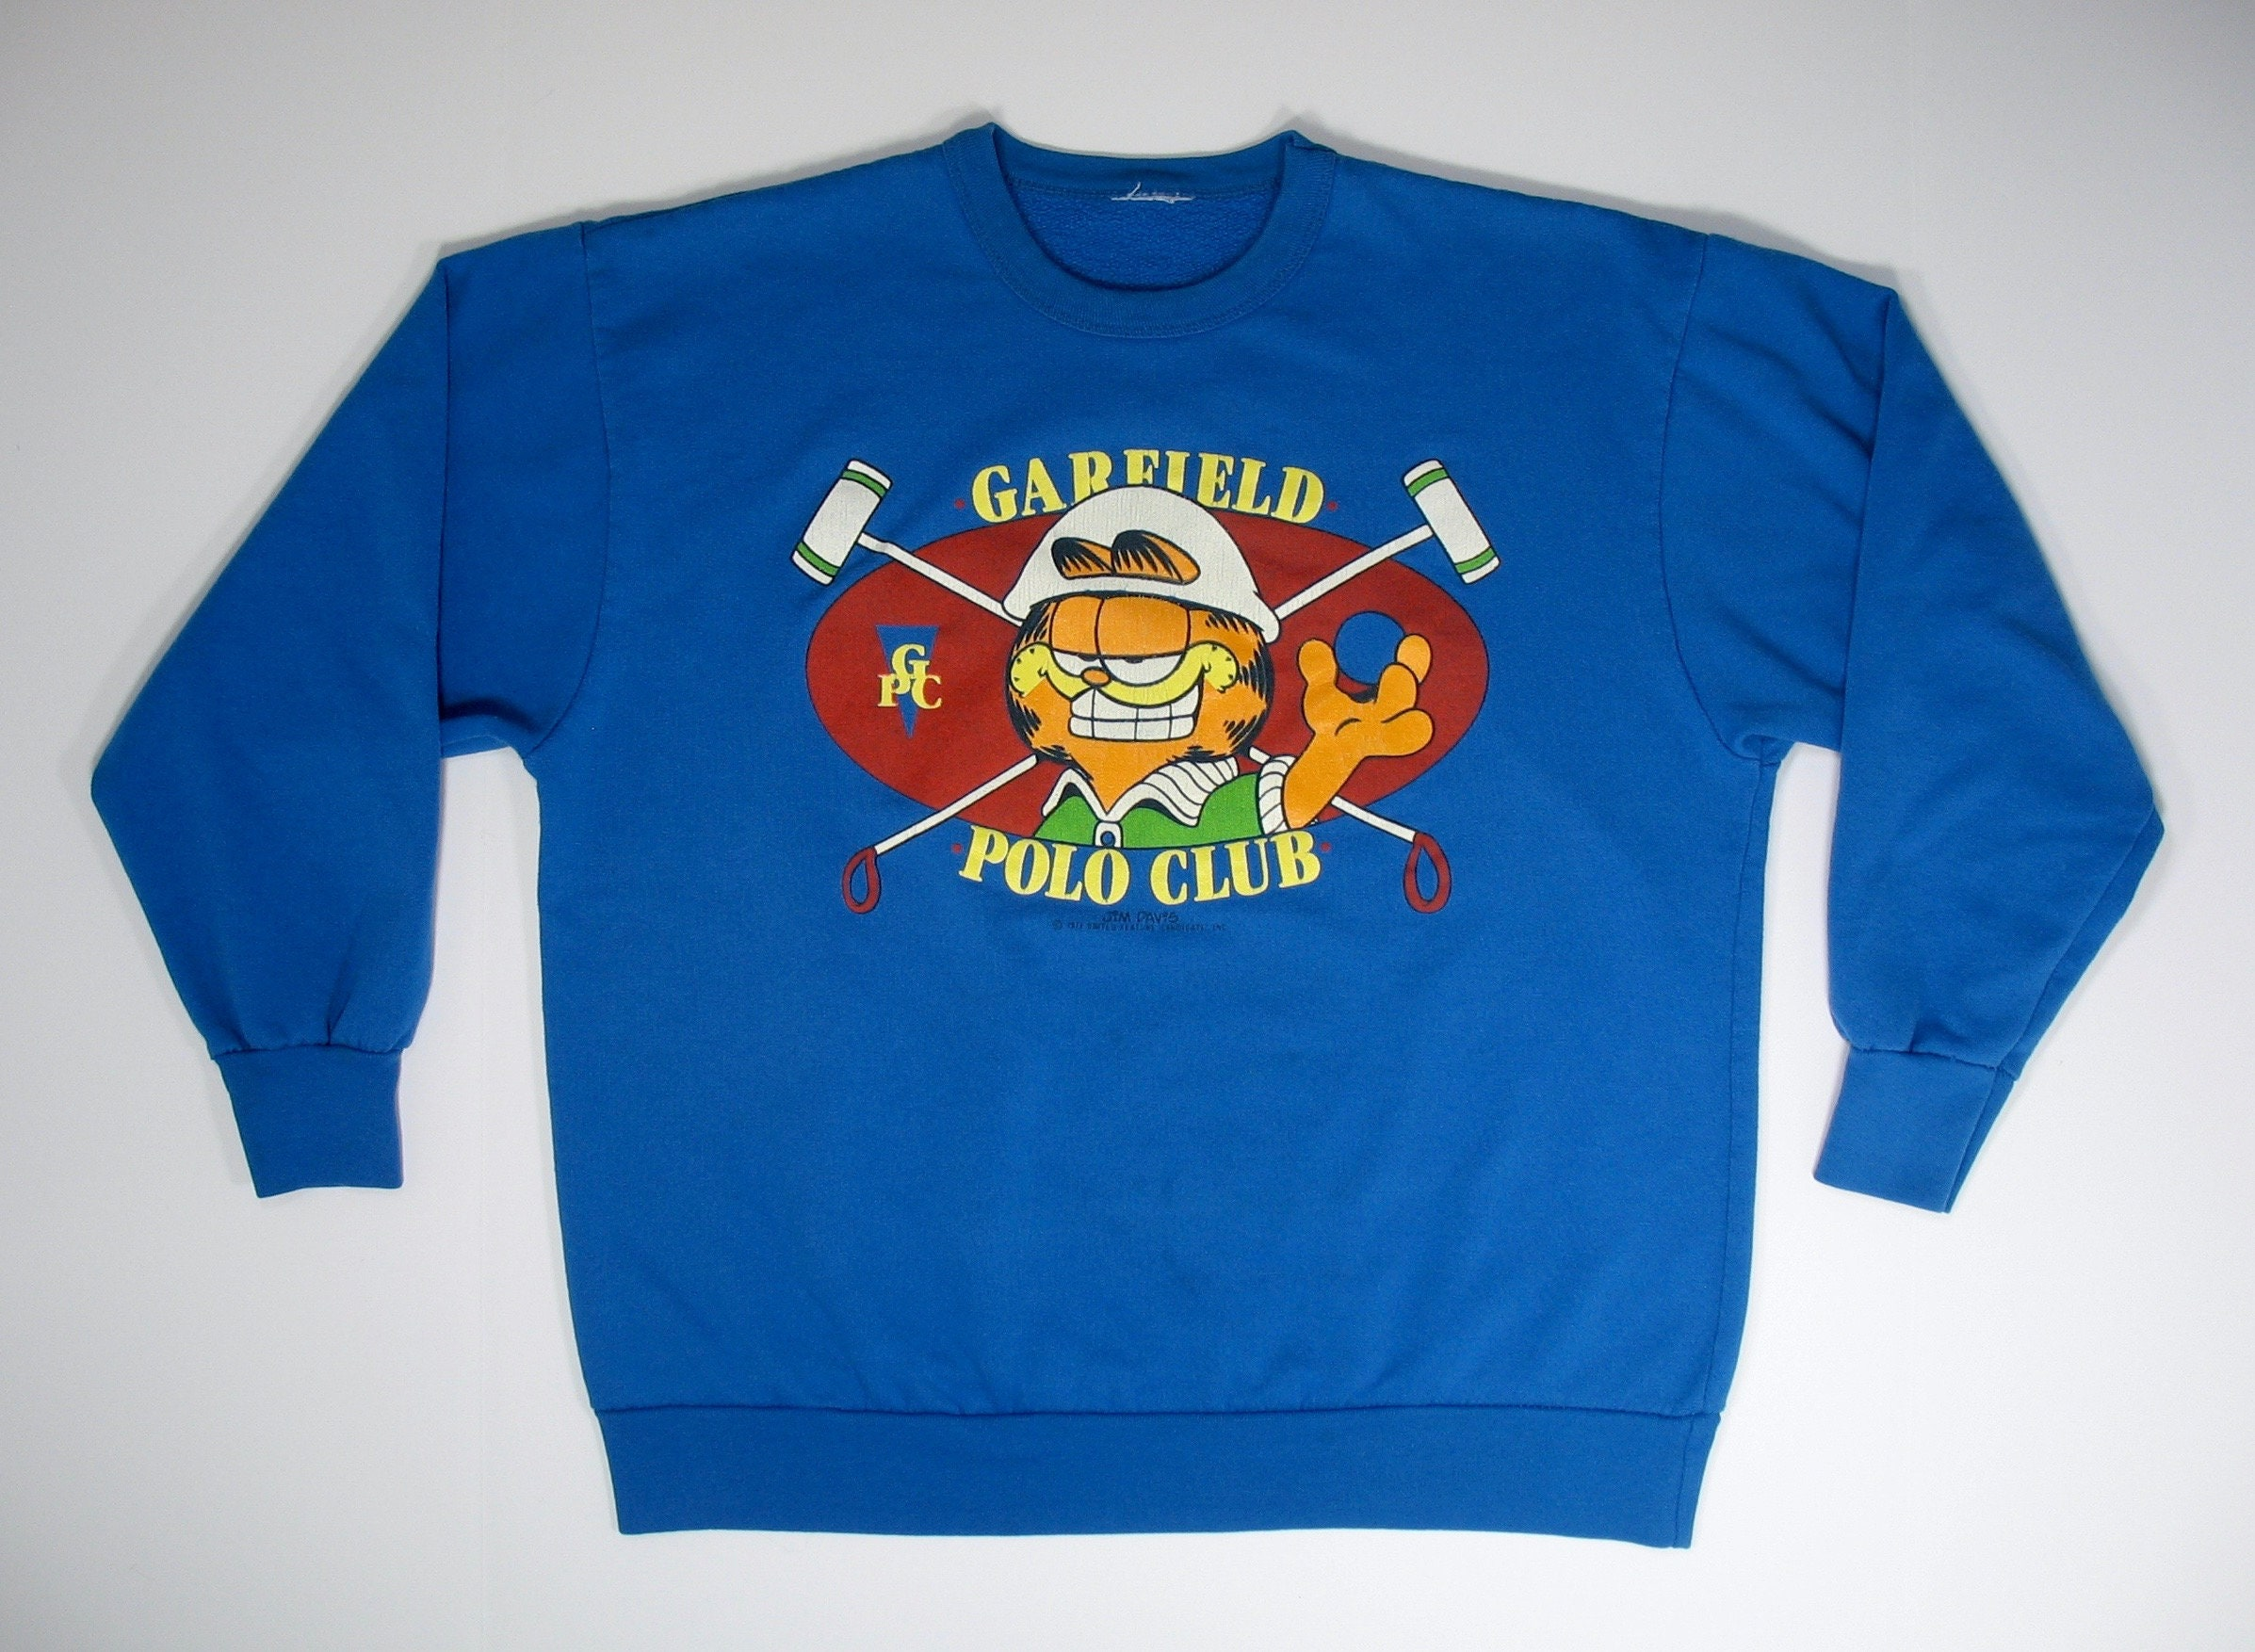 Vintage Garfield Sweatshirt Polo Club Medium 70s 80s Comic Strip Cat blue Rare cartoon funny cute sport 50 50 soft odie jim davis